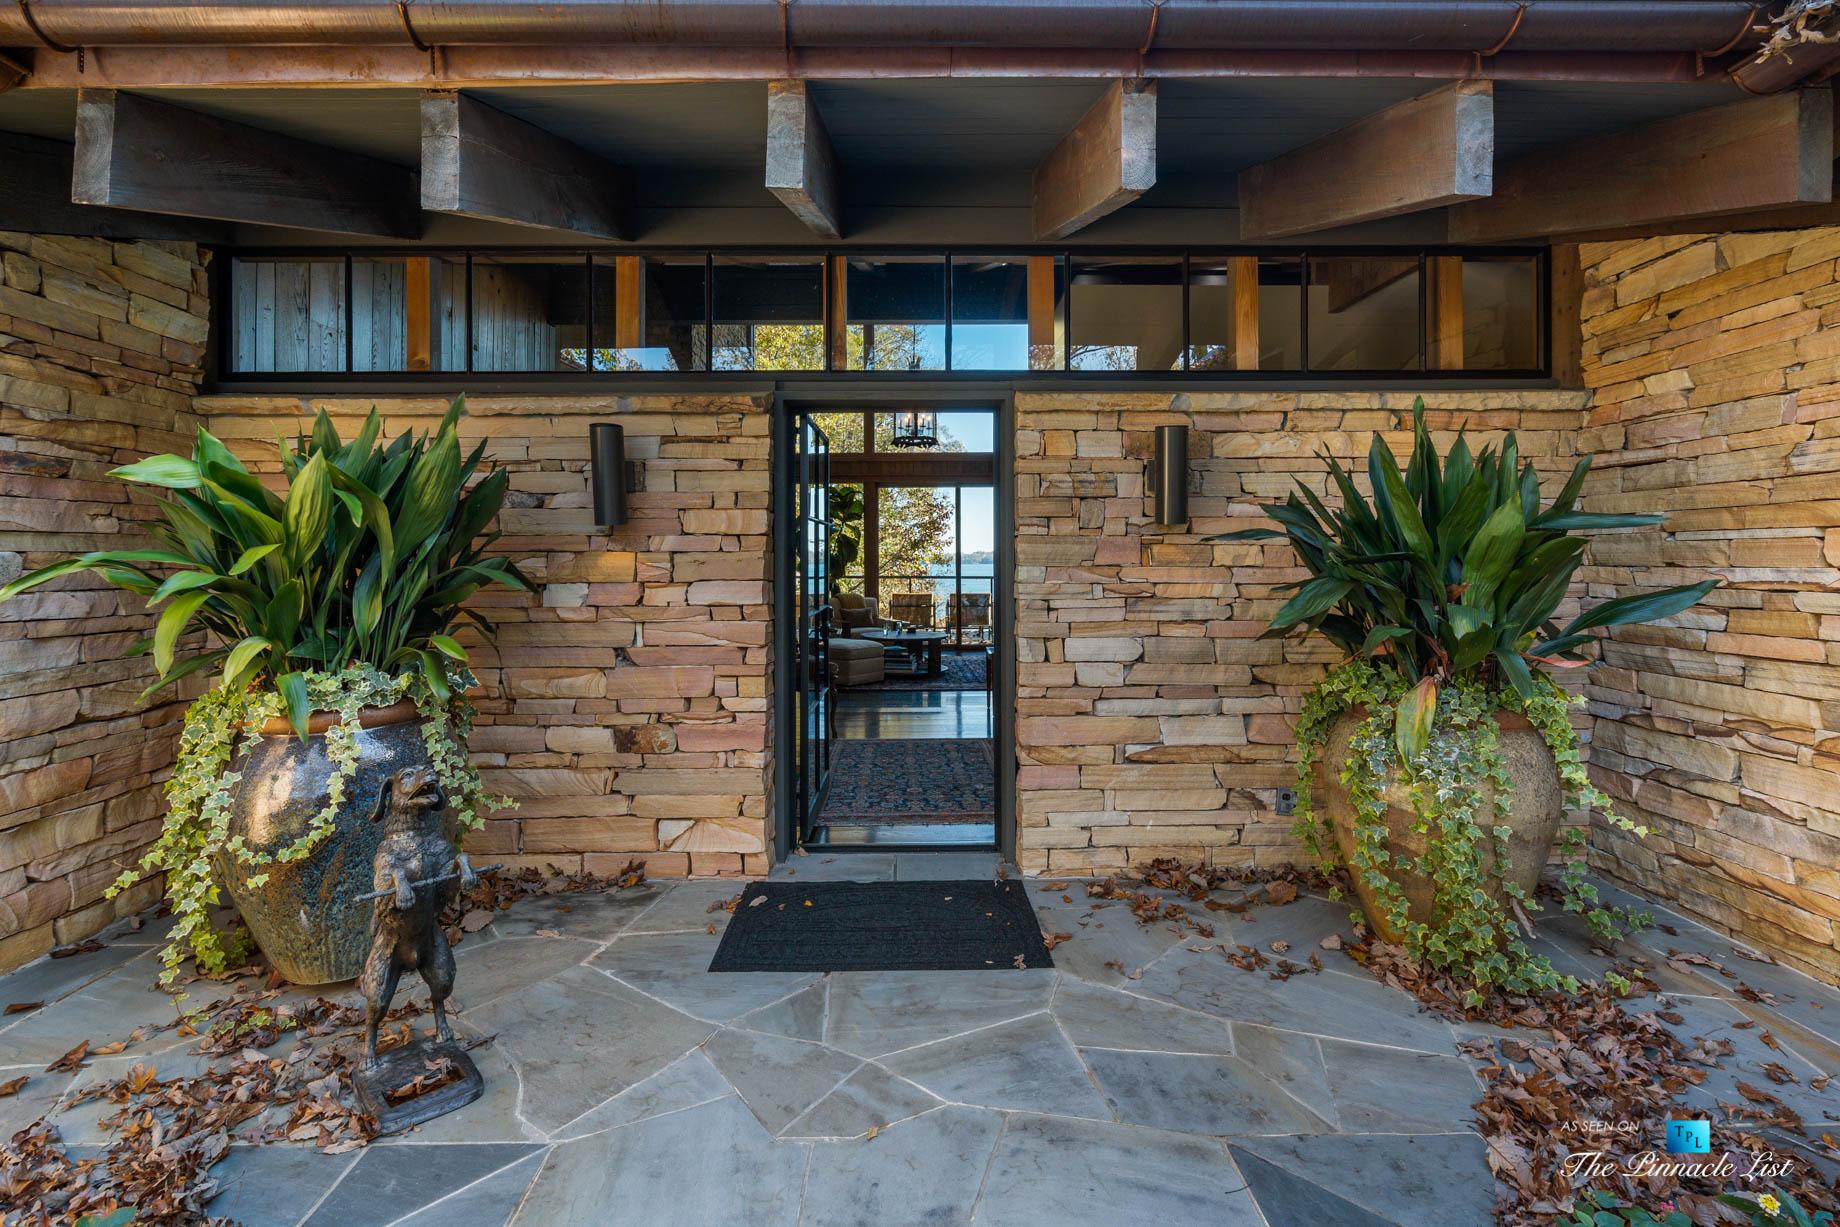 7860 Chestnut Hill Rd, Cumming, GA, USA – Front Entrance Door – Luxury Real Estate – Lake Lanier Mid-Century Modern Stone Home